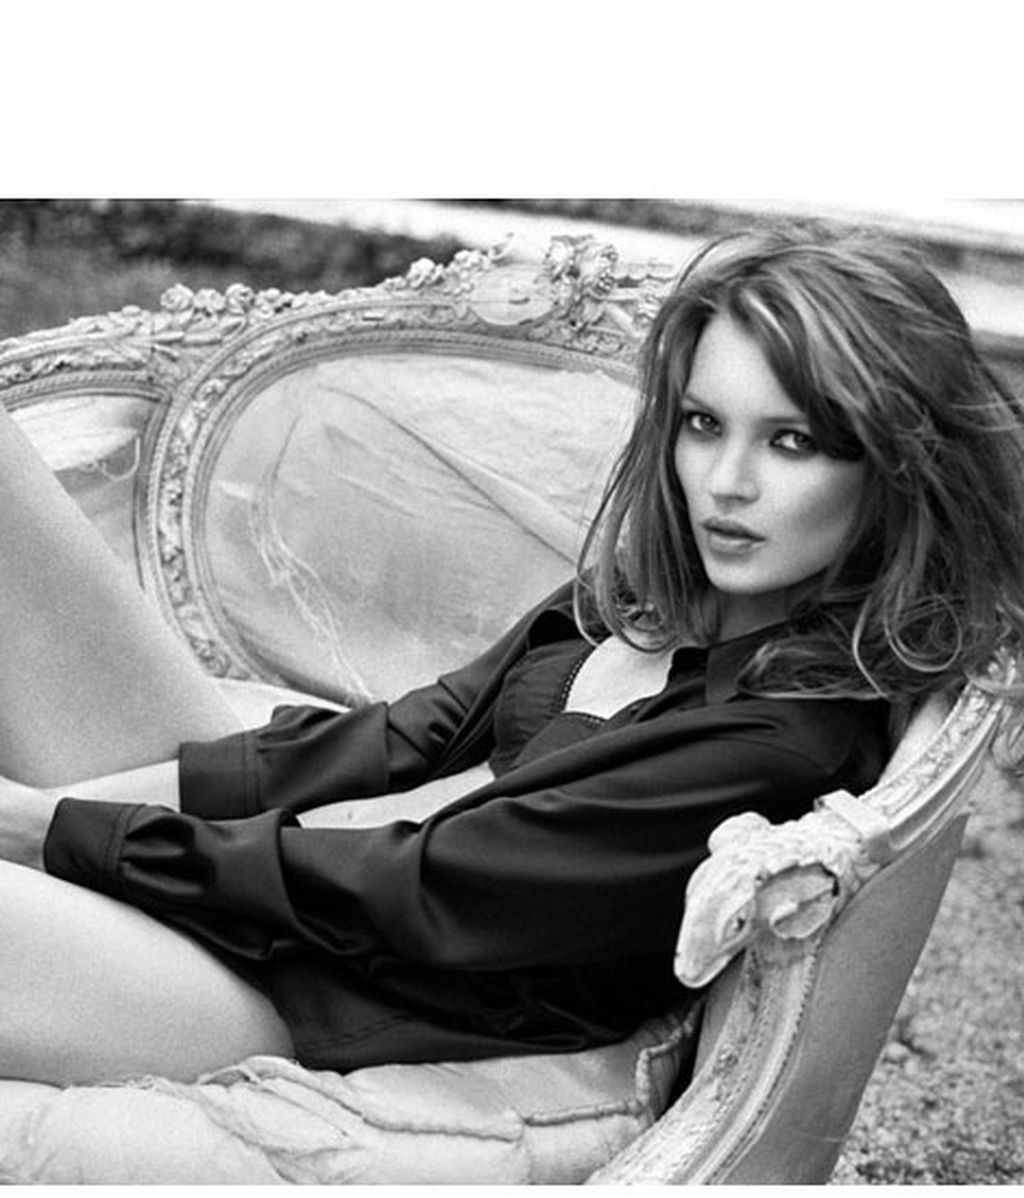 Kate Moss, quién da más